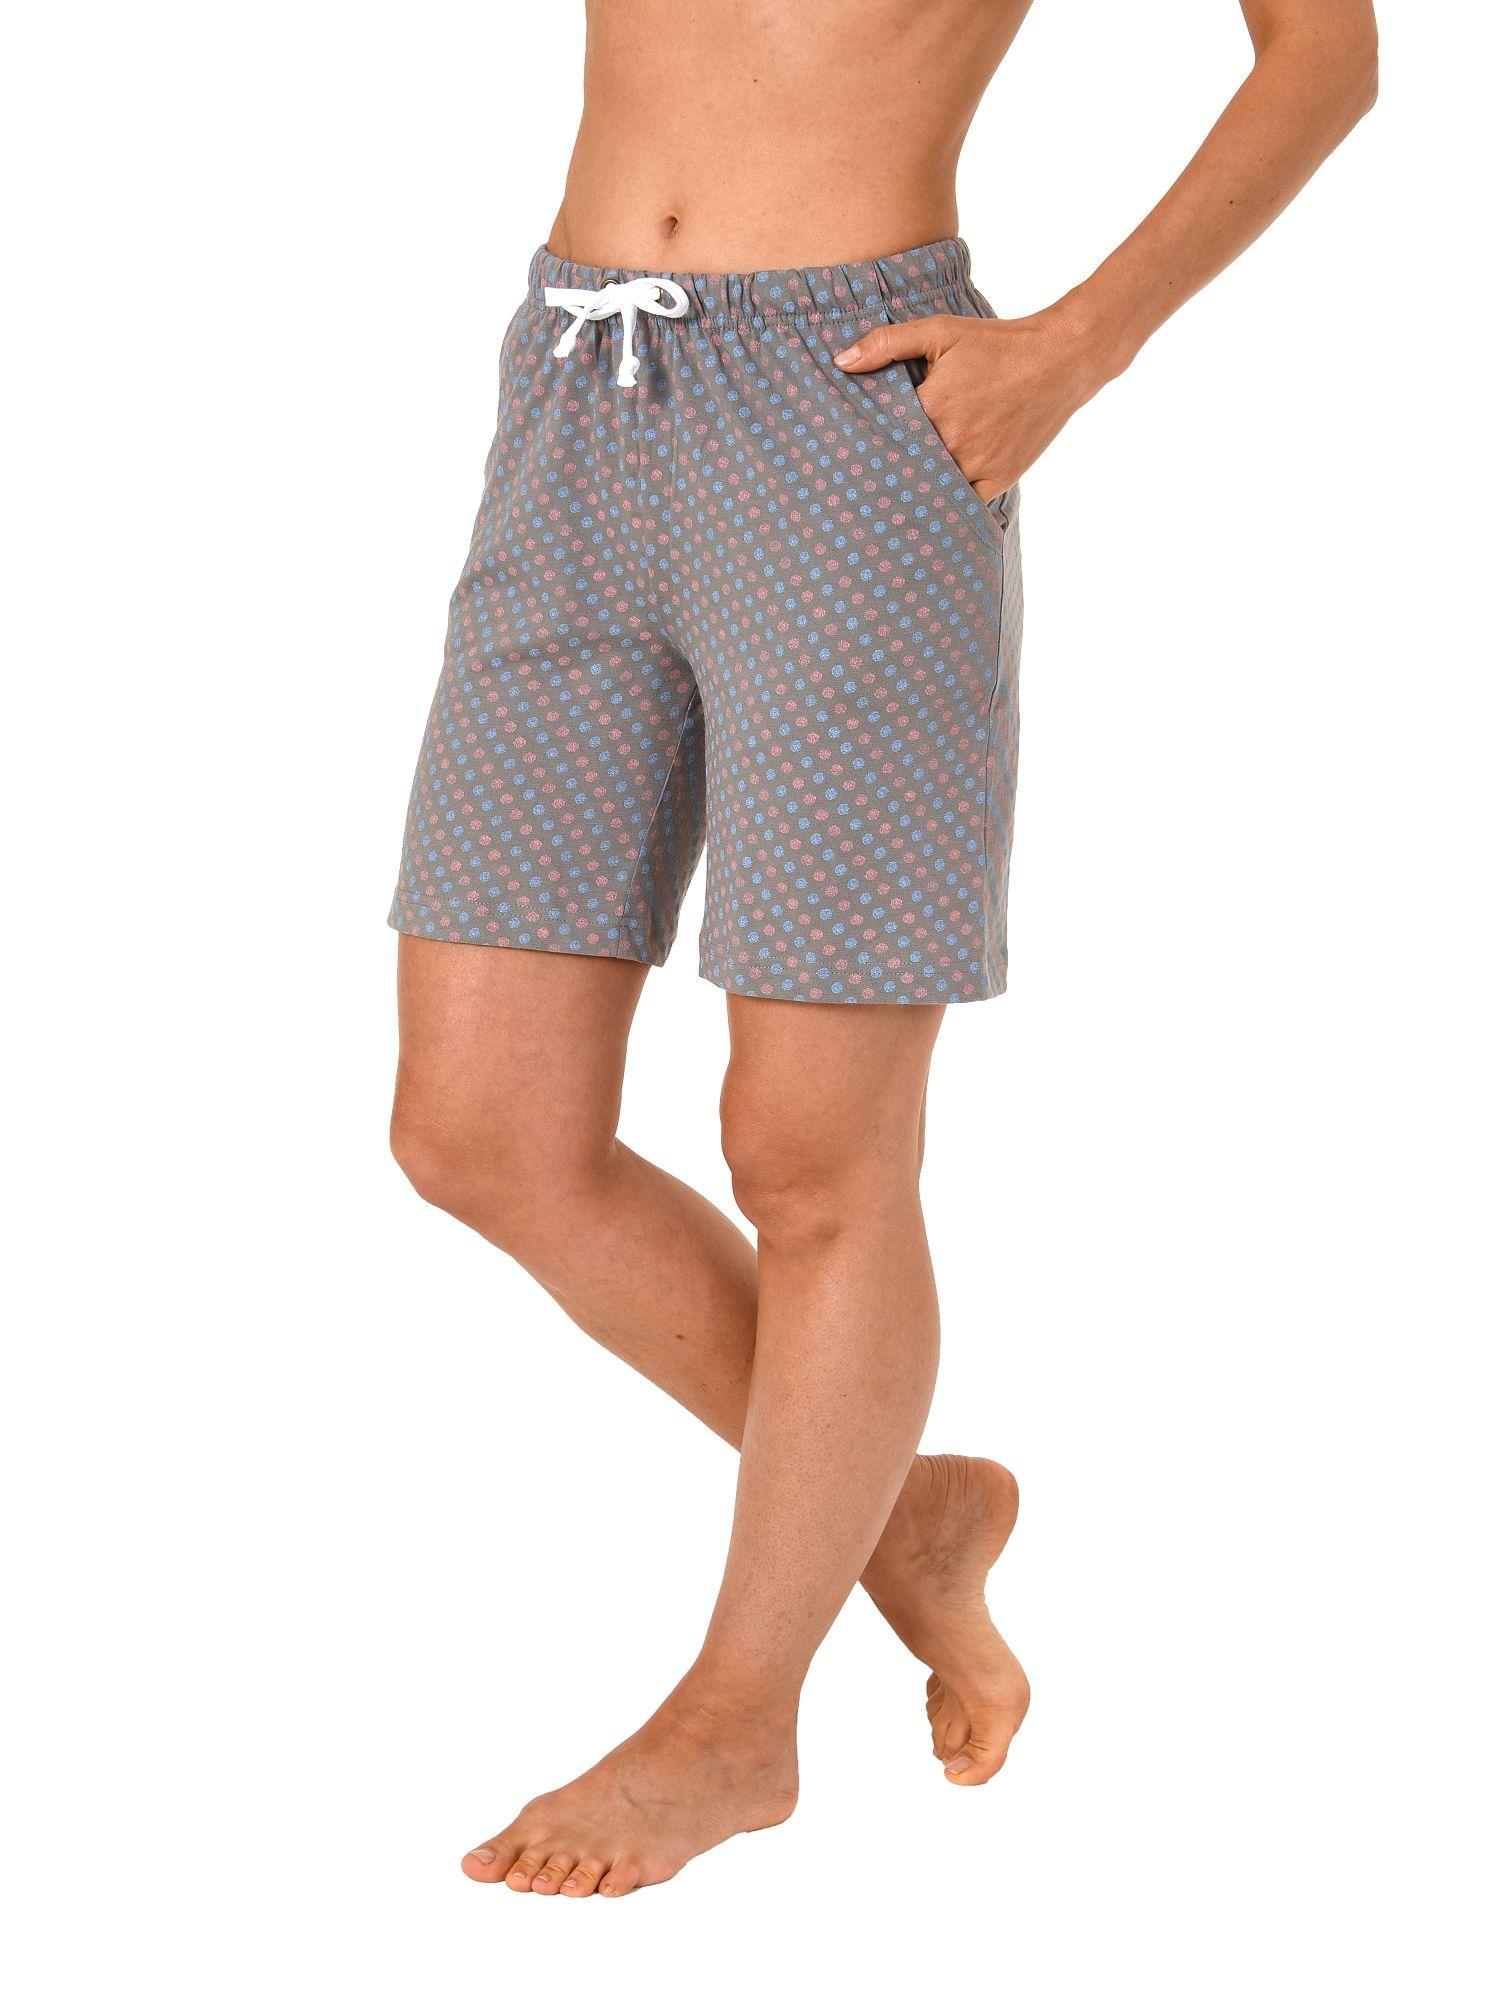 Damen Bermuda Pyjamahose kurz Tupfen Mix /& Match ideal zum kombinieren  90 904